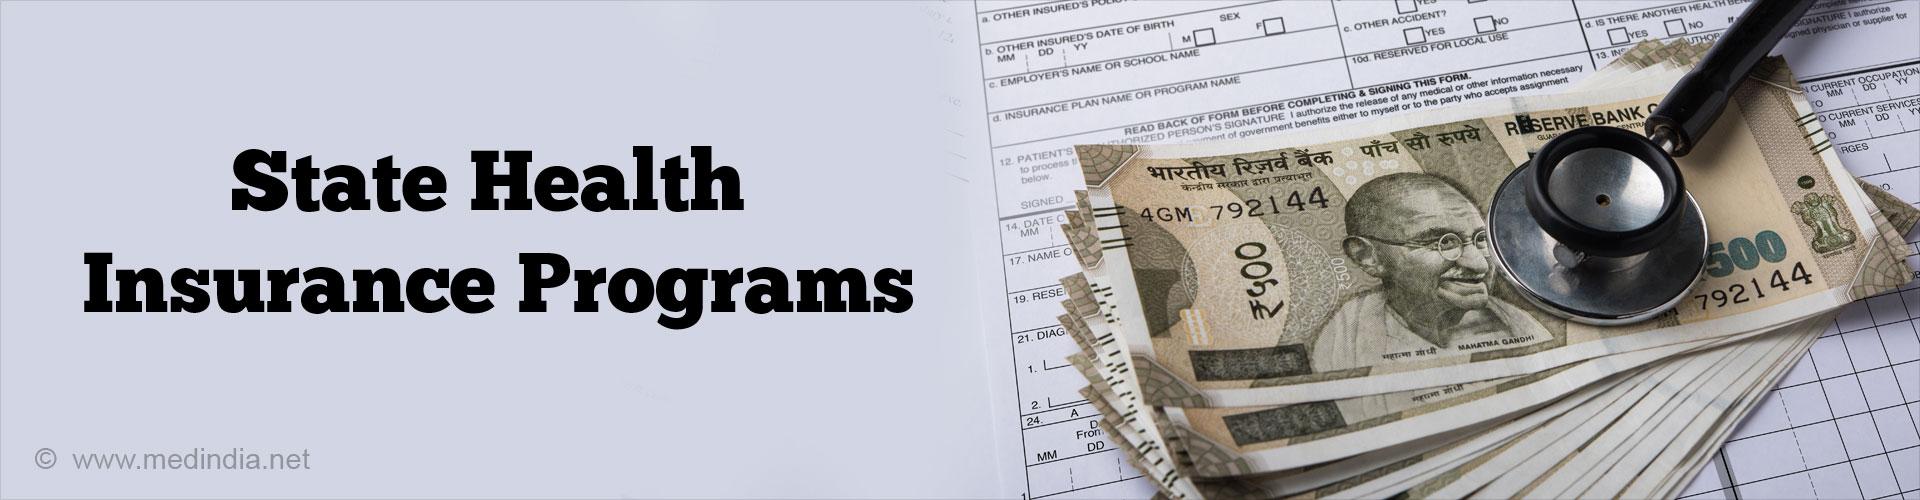 State Health Insurance Programs